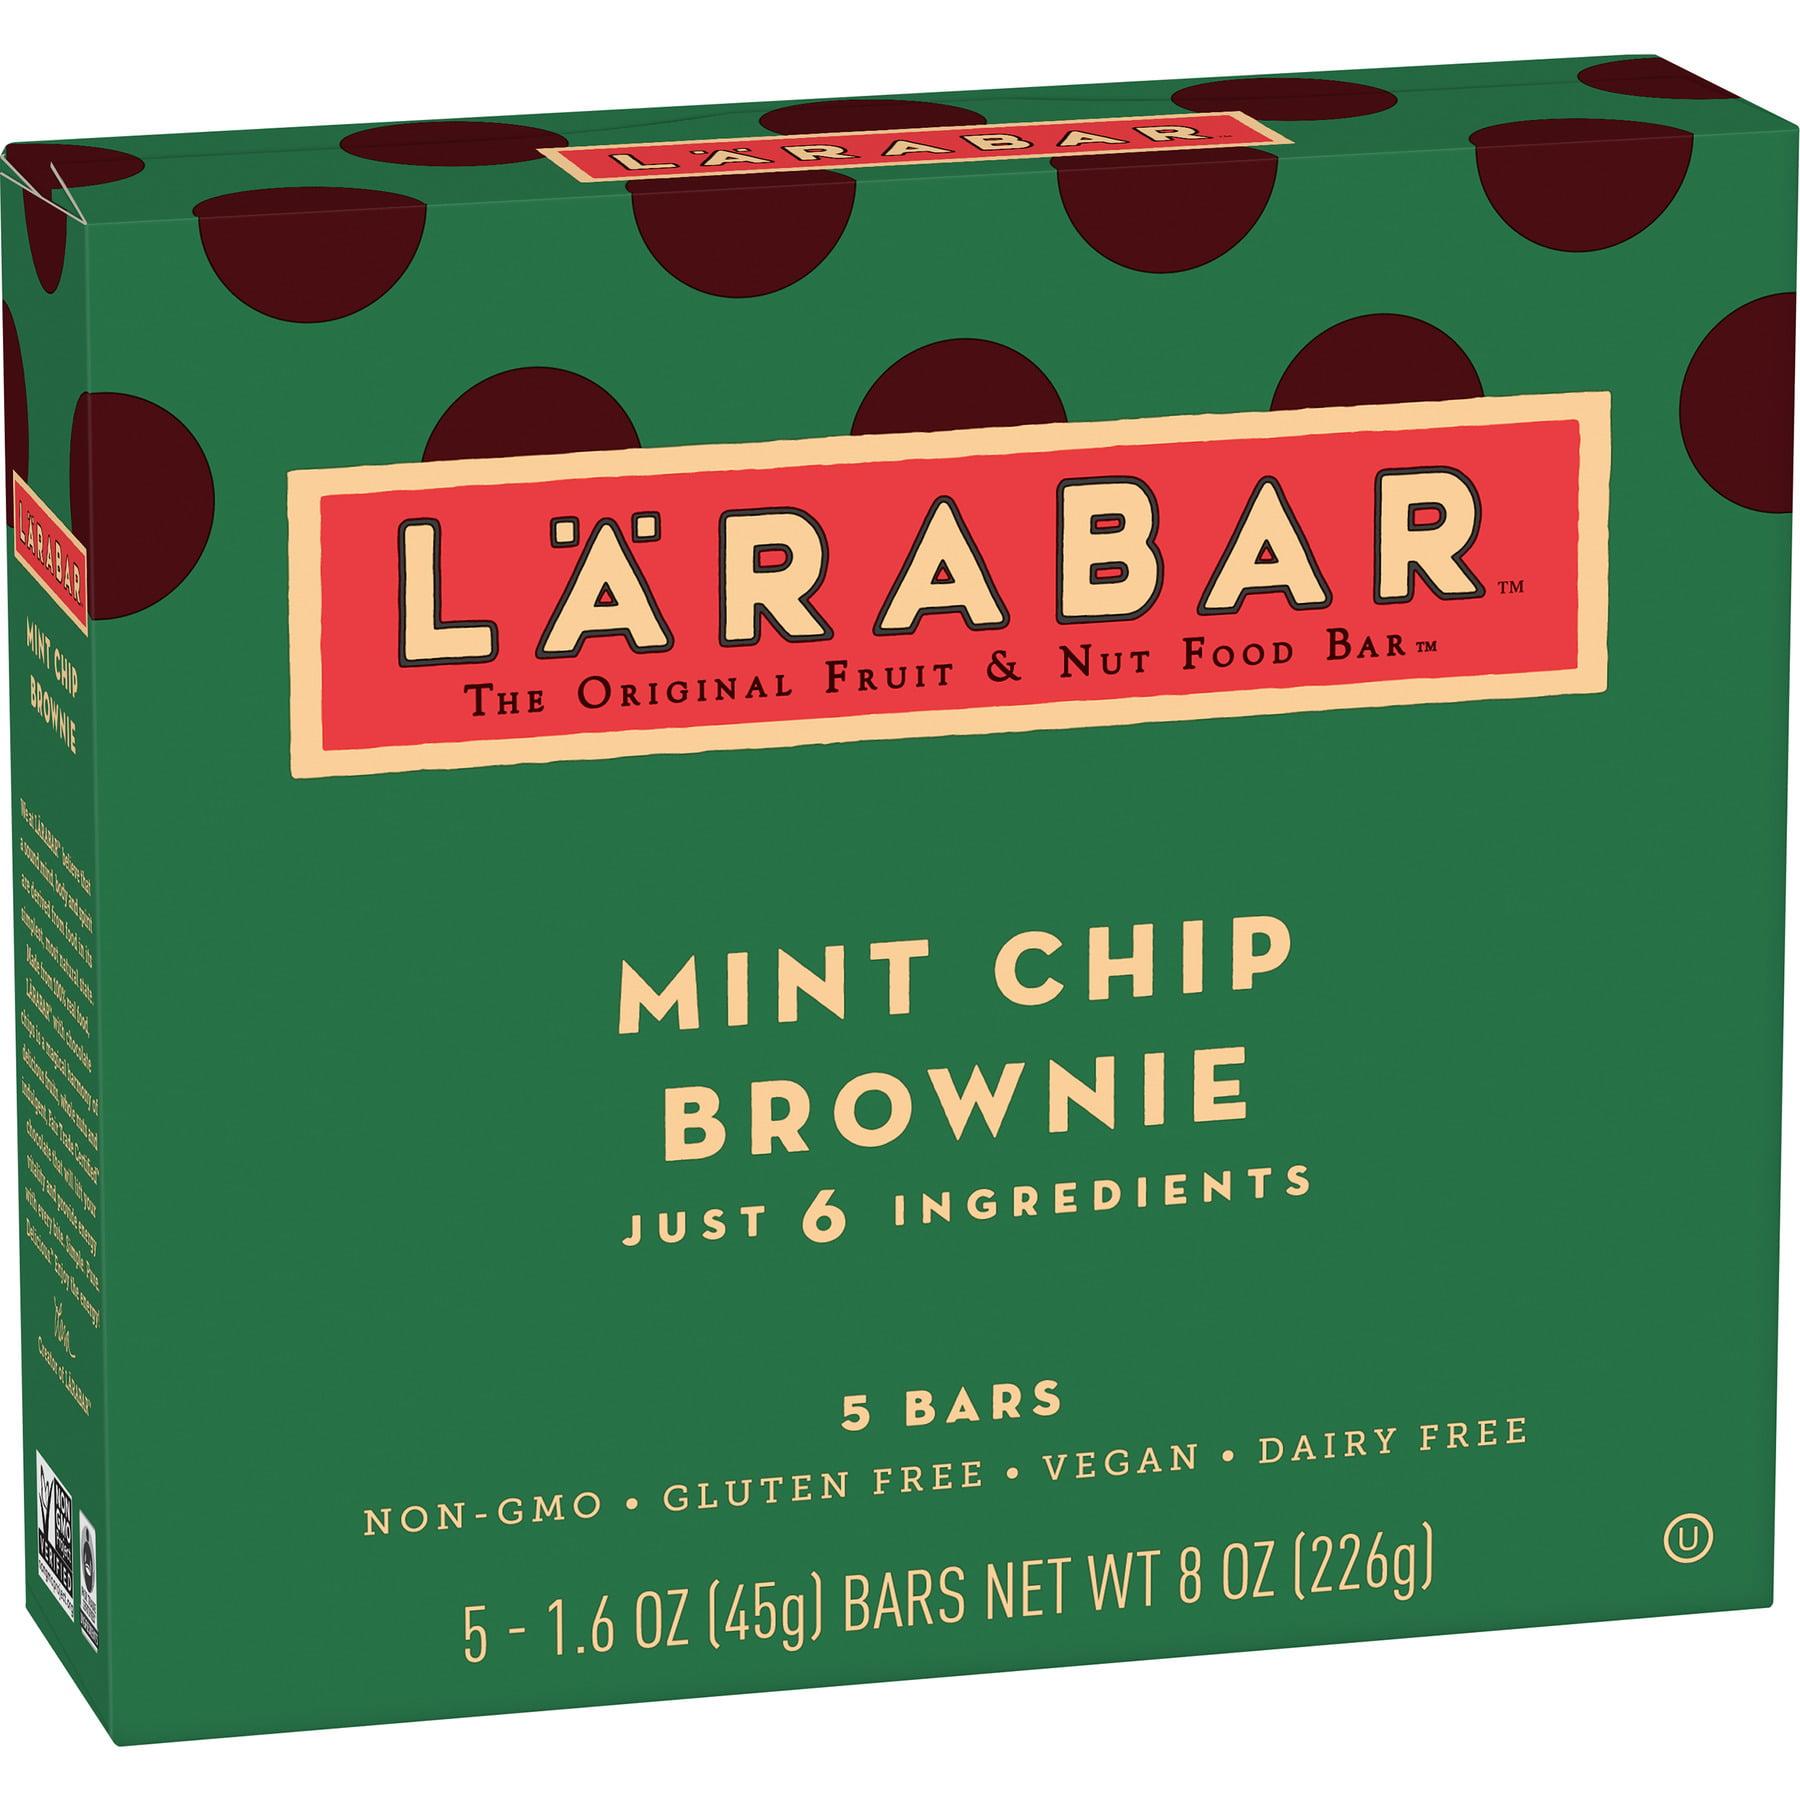 Larabar Gluten Free Bar, Mint Chip Brownie, 1.6 oz Bars (5 Count)